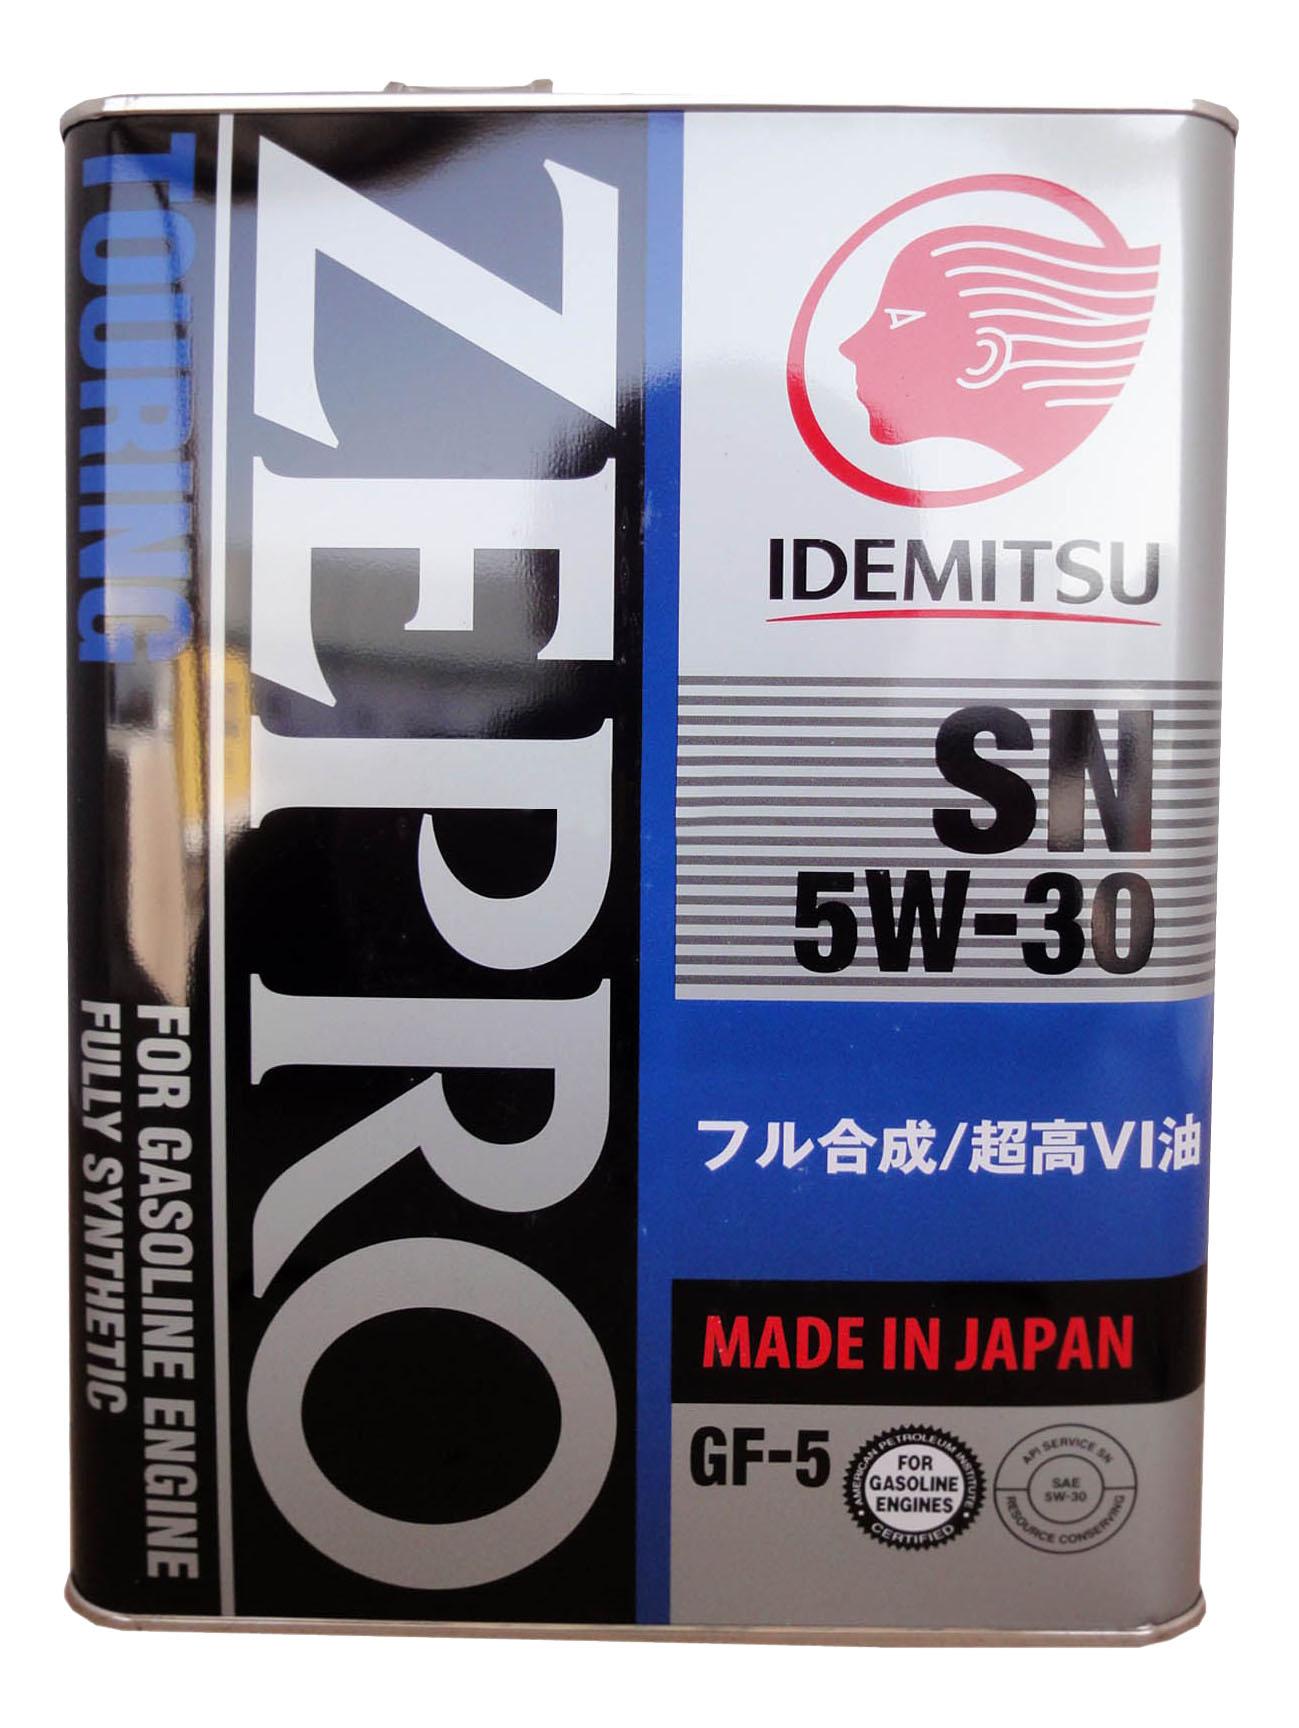 Моторное масло Idemitsu Zepro Touring SN/GF-5 5W-30 4л